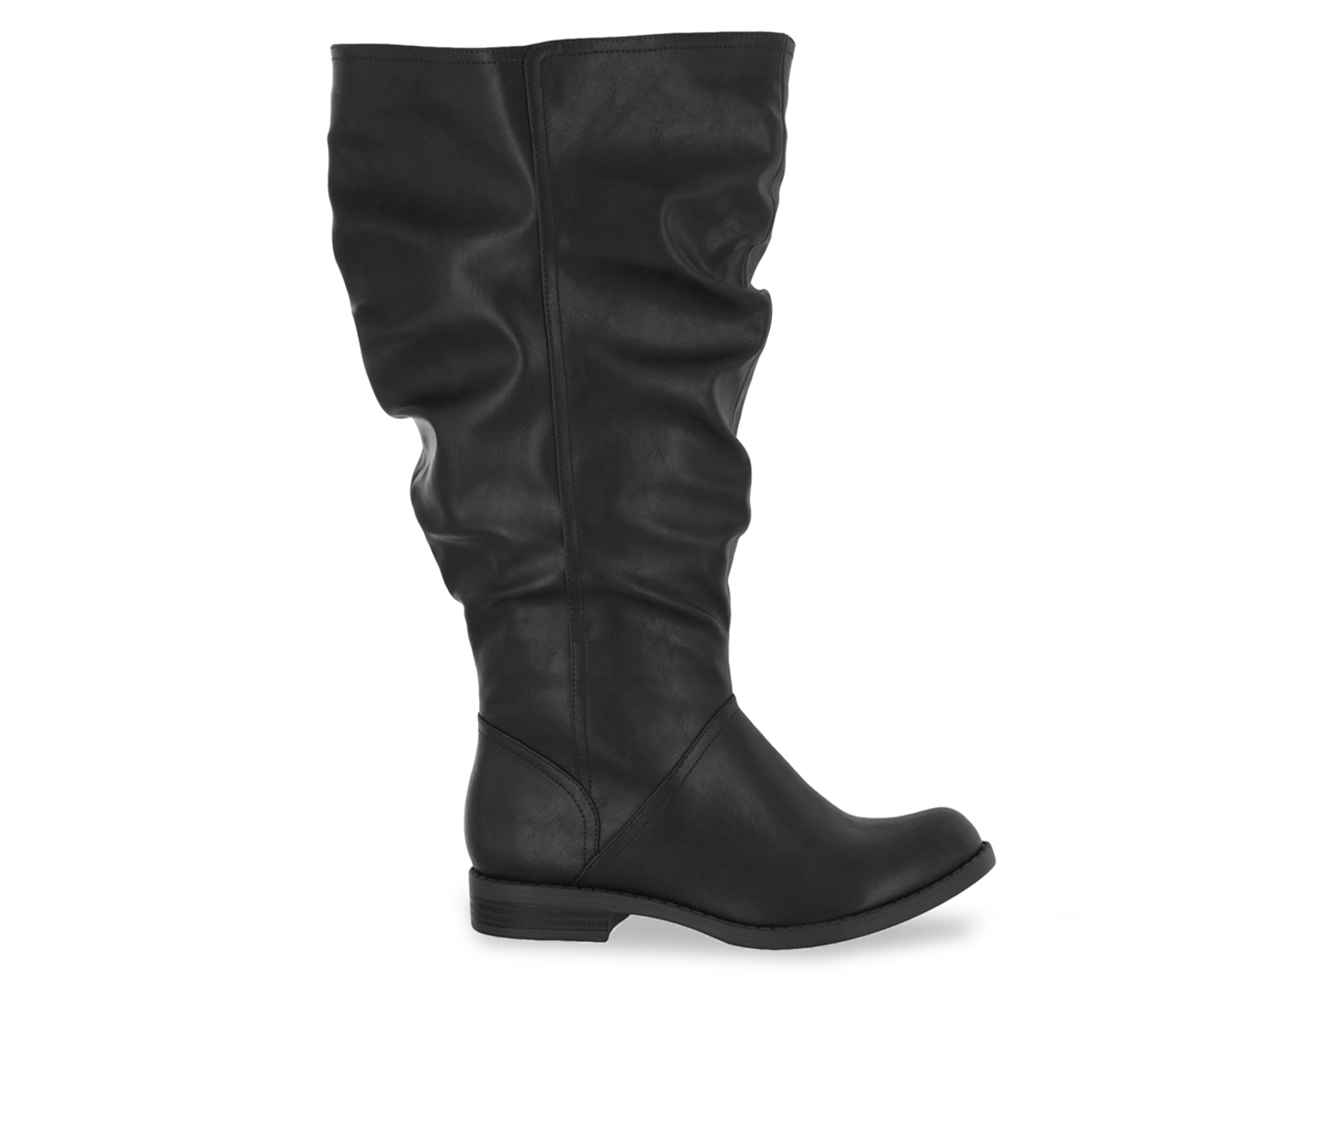 Easy Street Peak Plus Plus Women's Boot (Black Faux Leather)